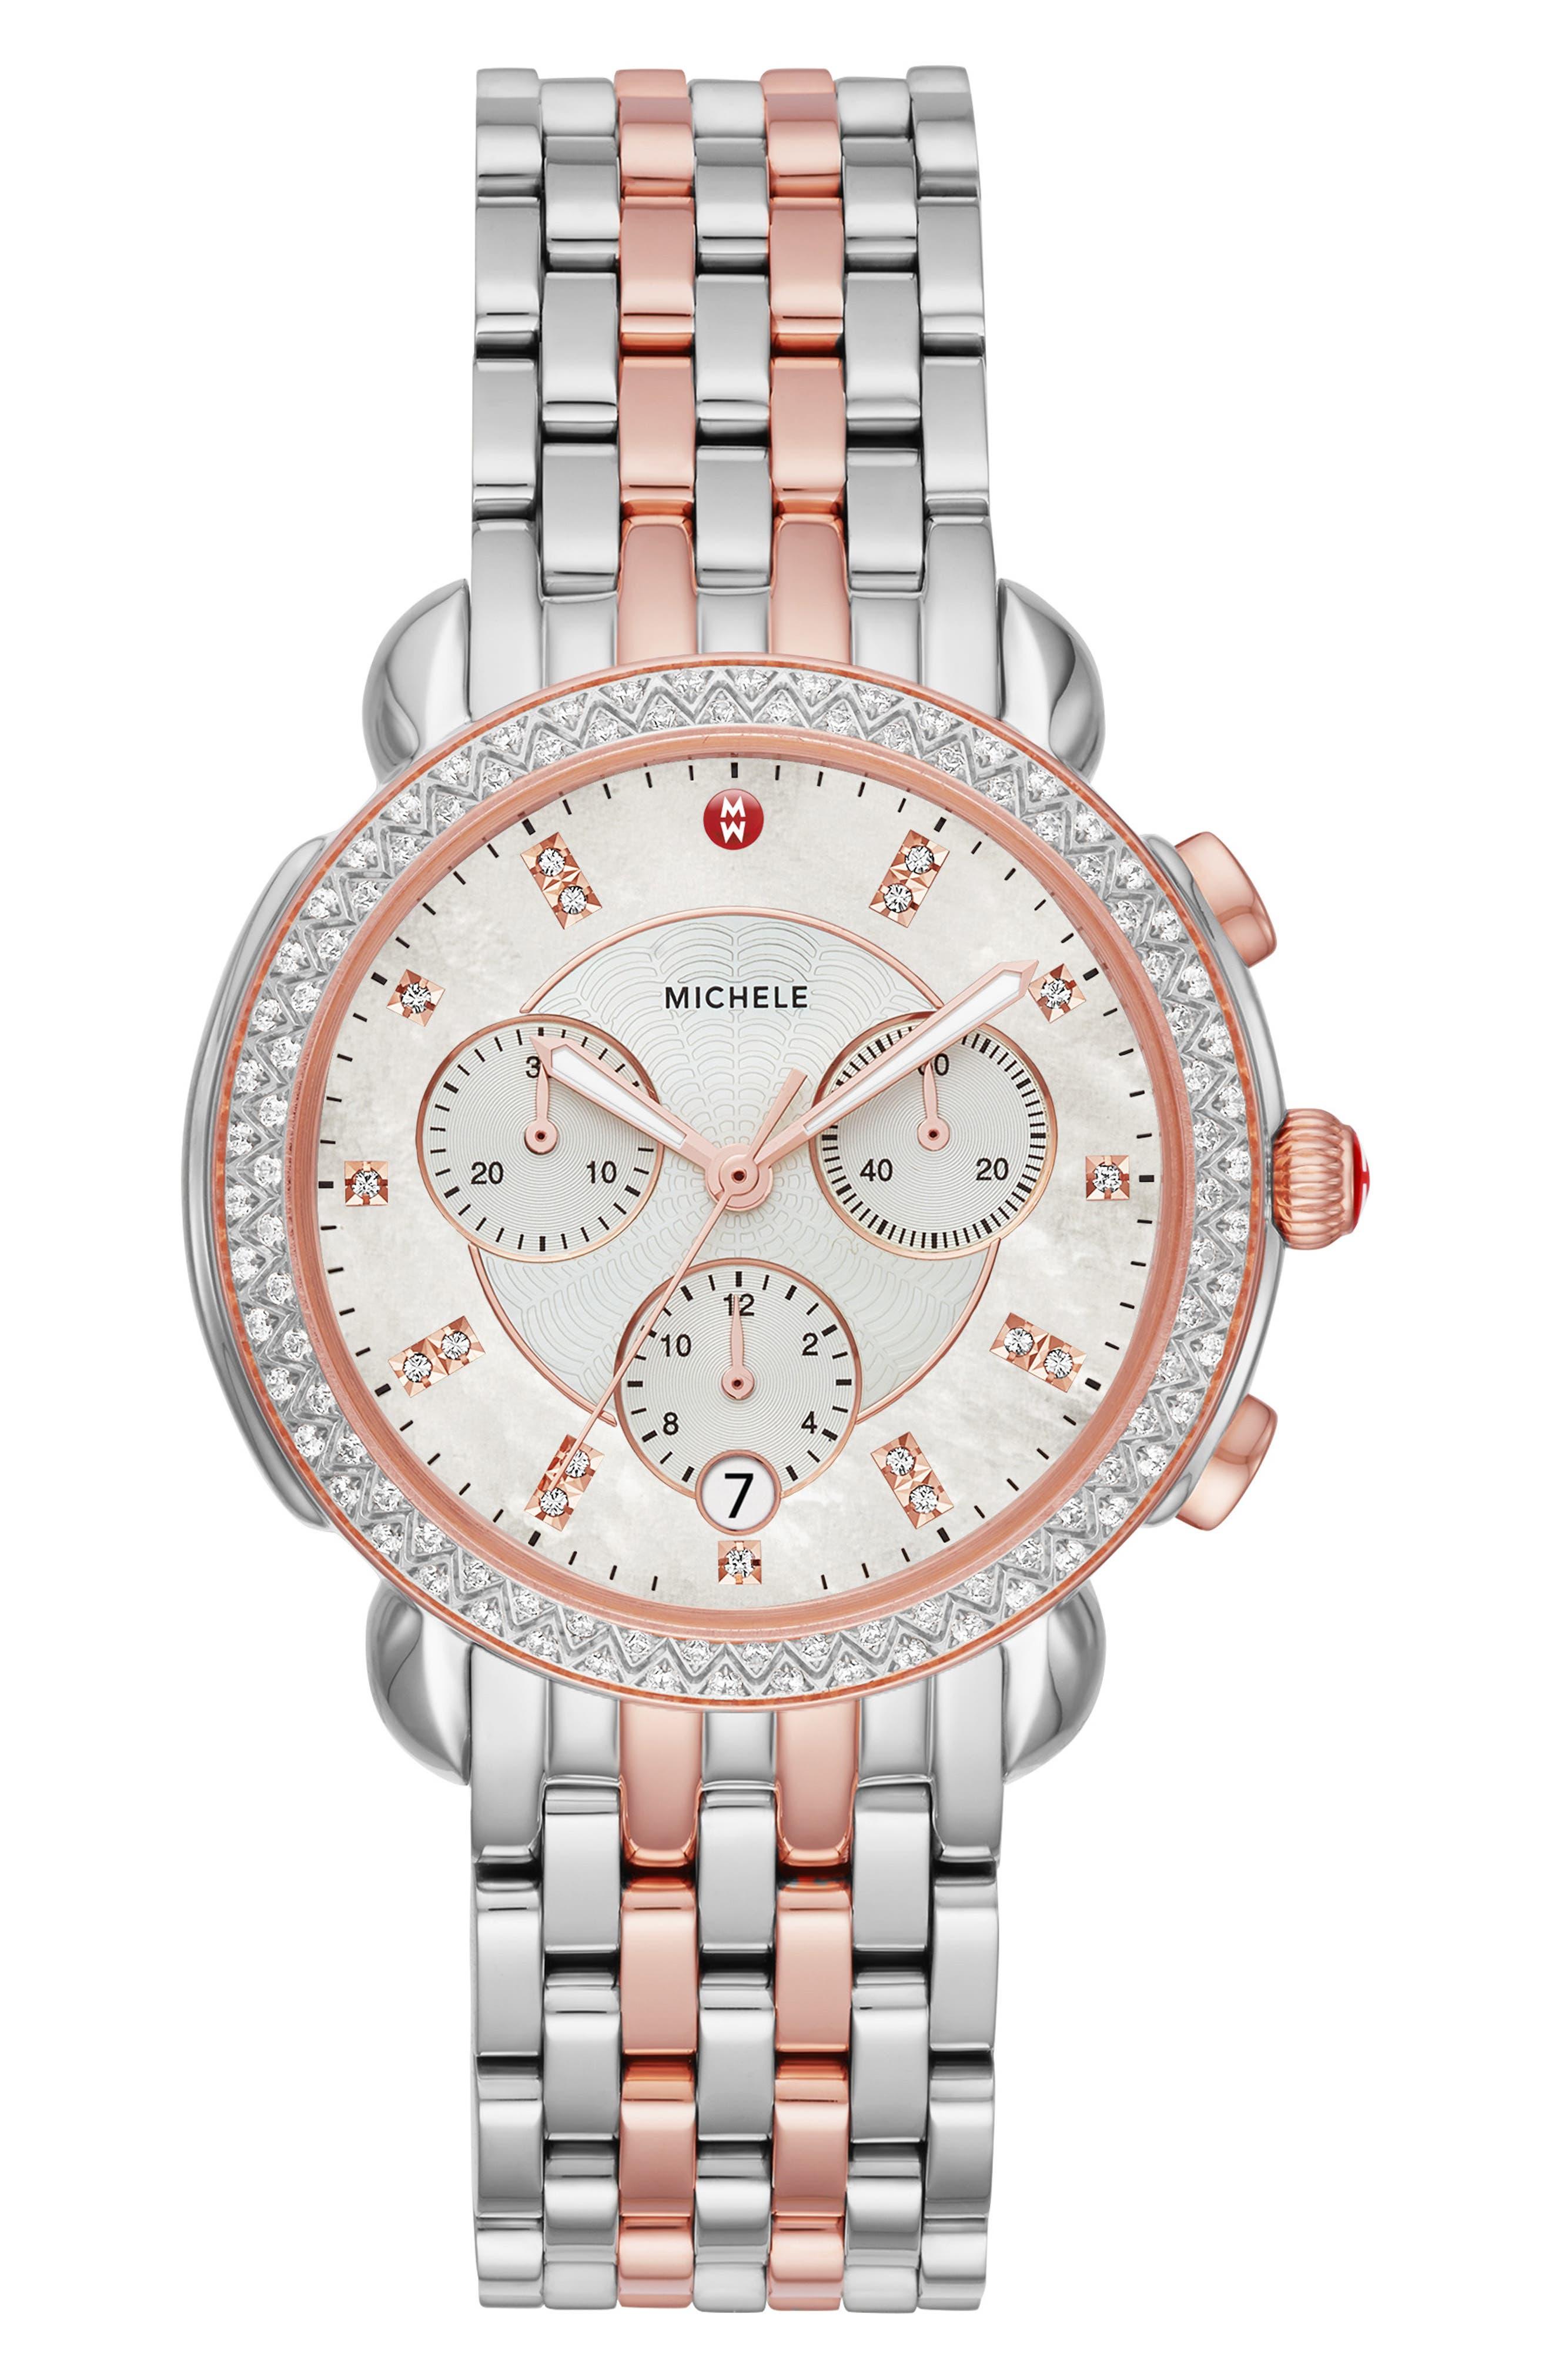 MICHELE Sidney Chrono Diamond Diamond Dial Watch Case, 38mm, Main, color, ROSE GOLD/ MOP/ SILVER